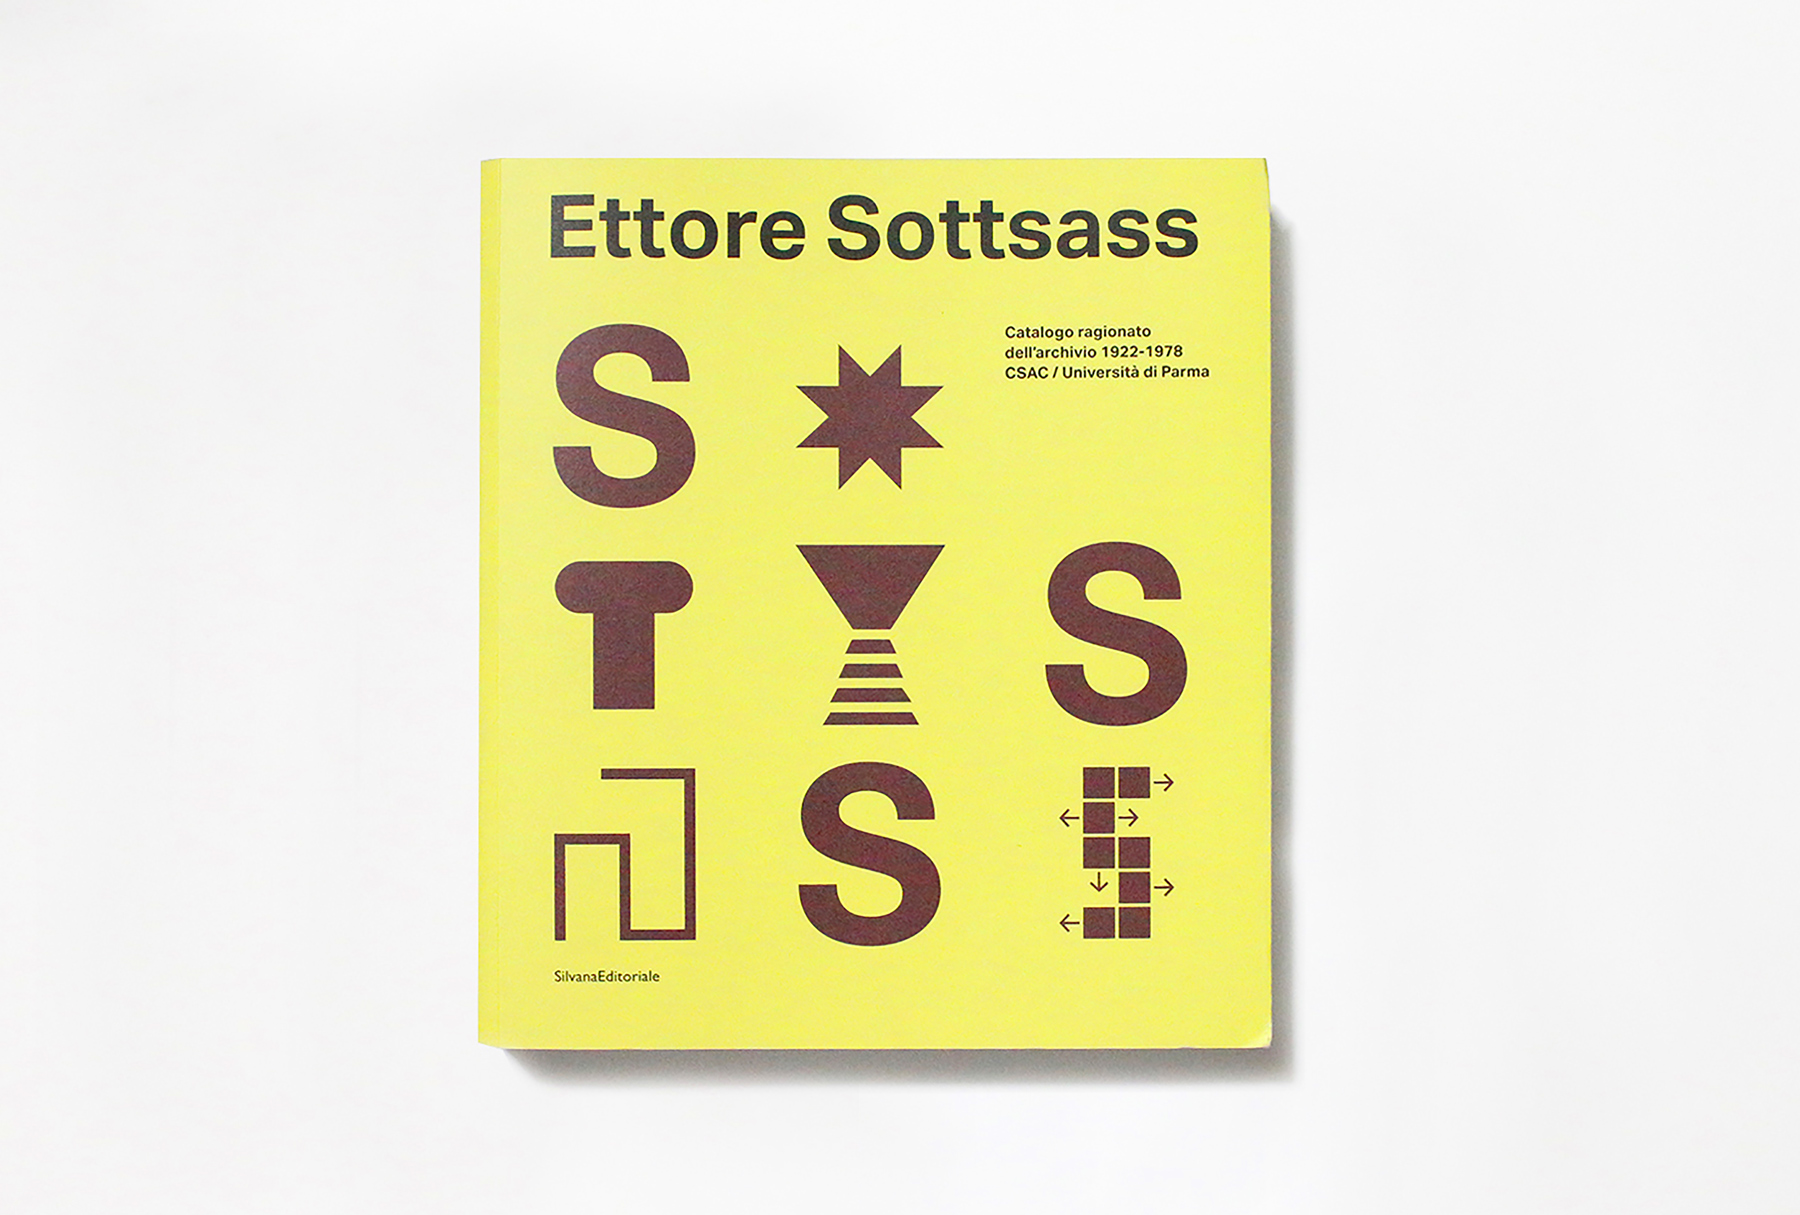 2017_Ettore-Sottsass_Libro_02